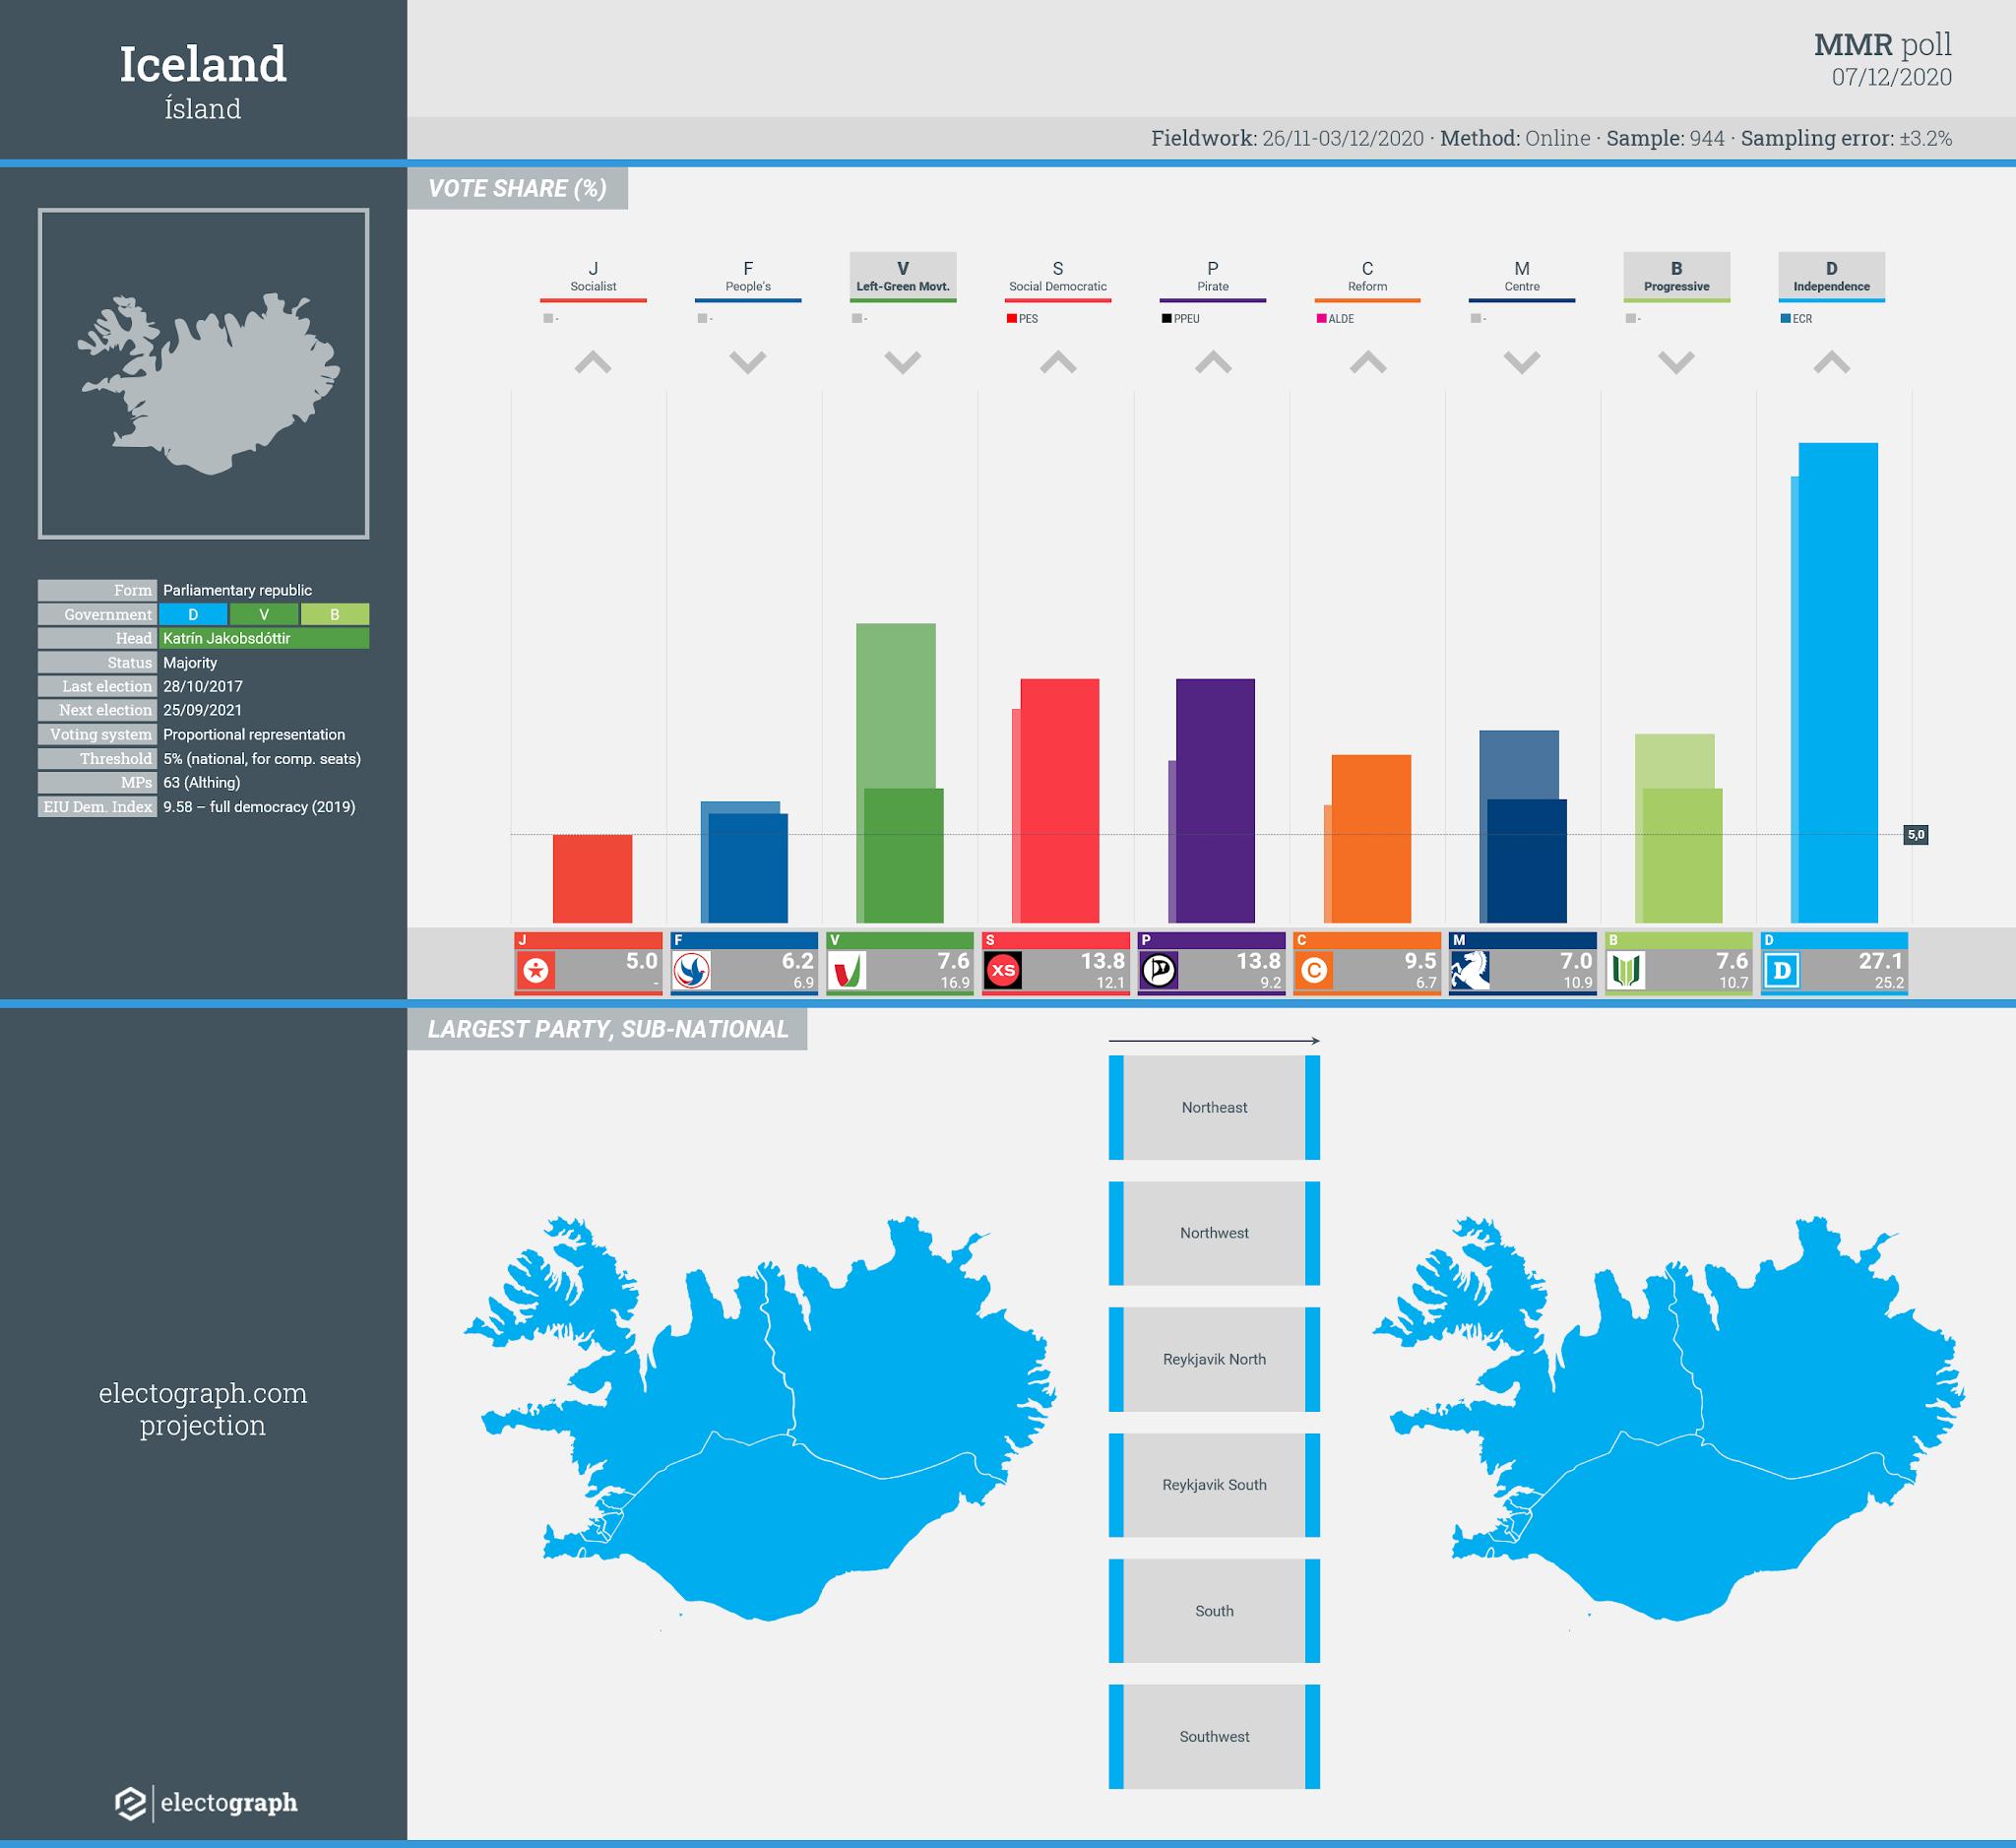 ICELAND: MMR poll chart, 7 December 2020